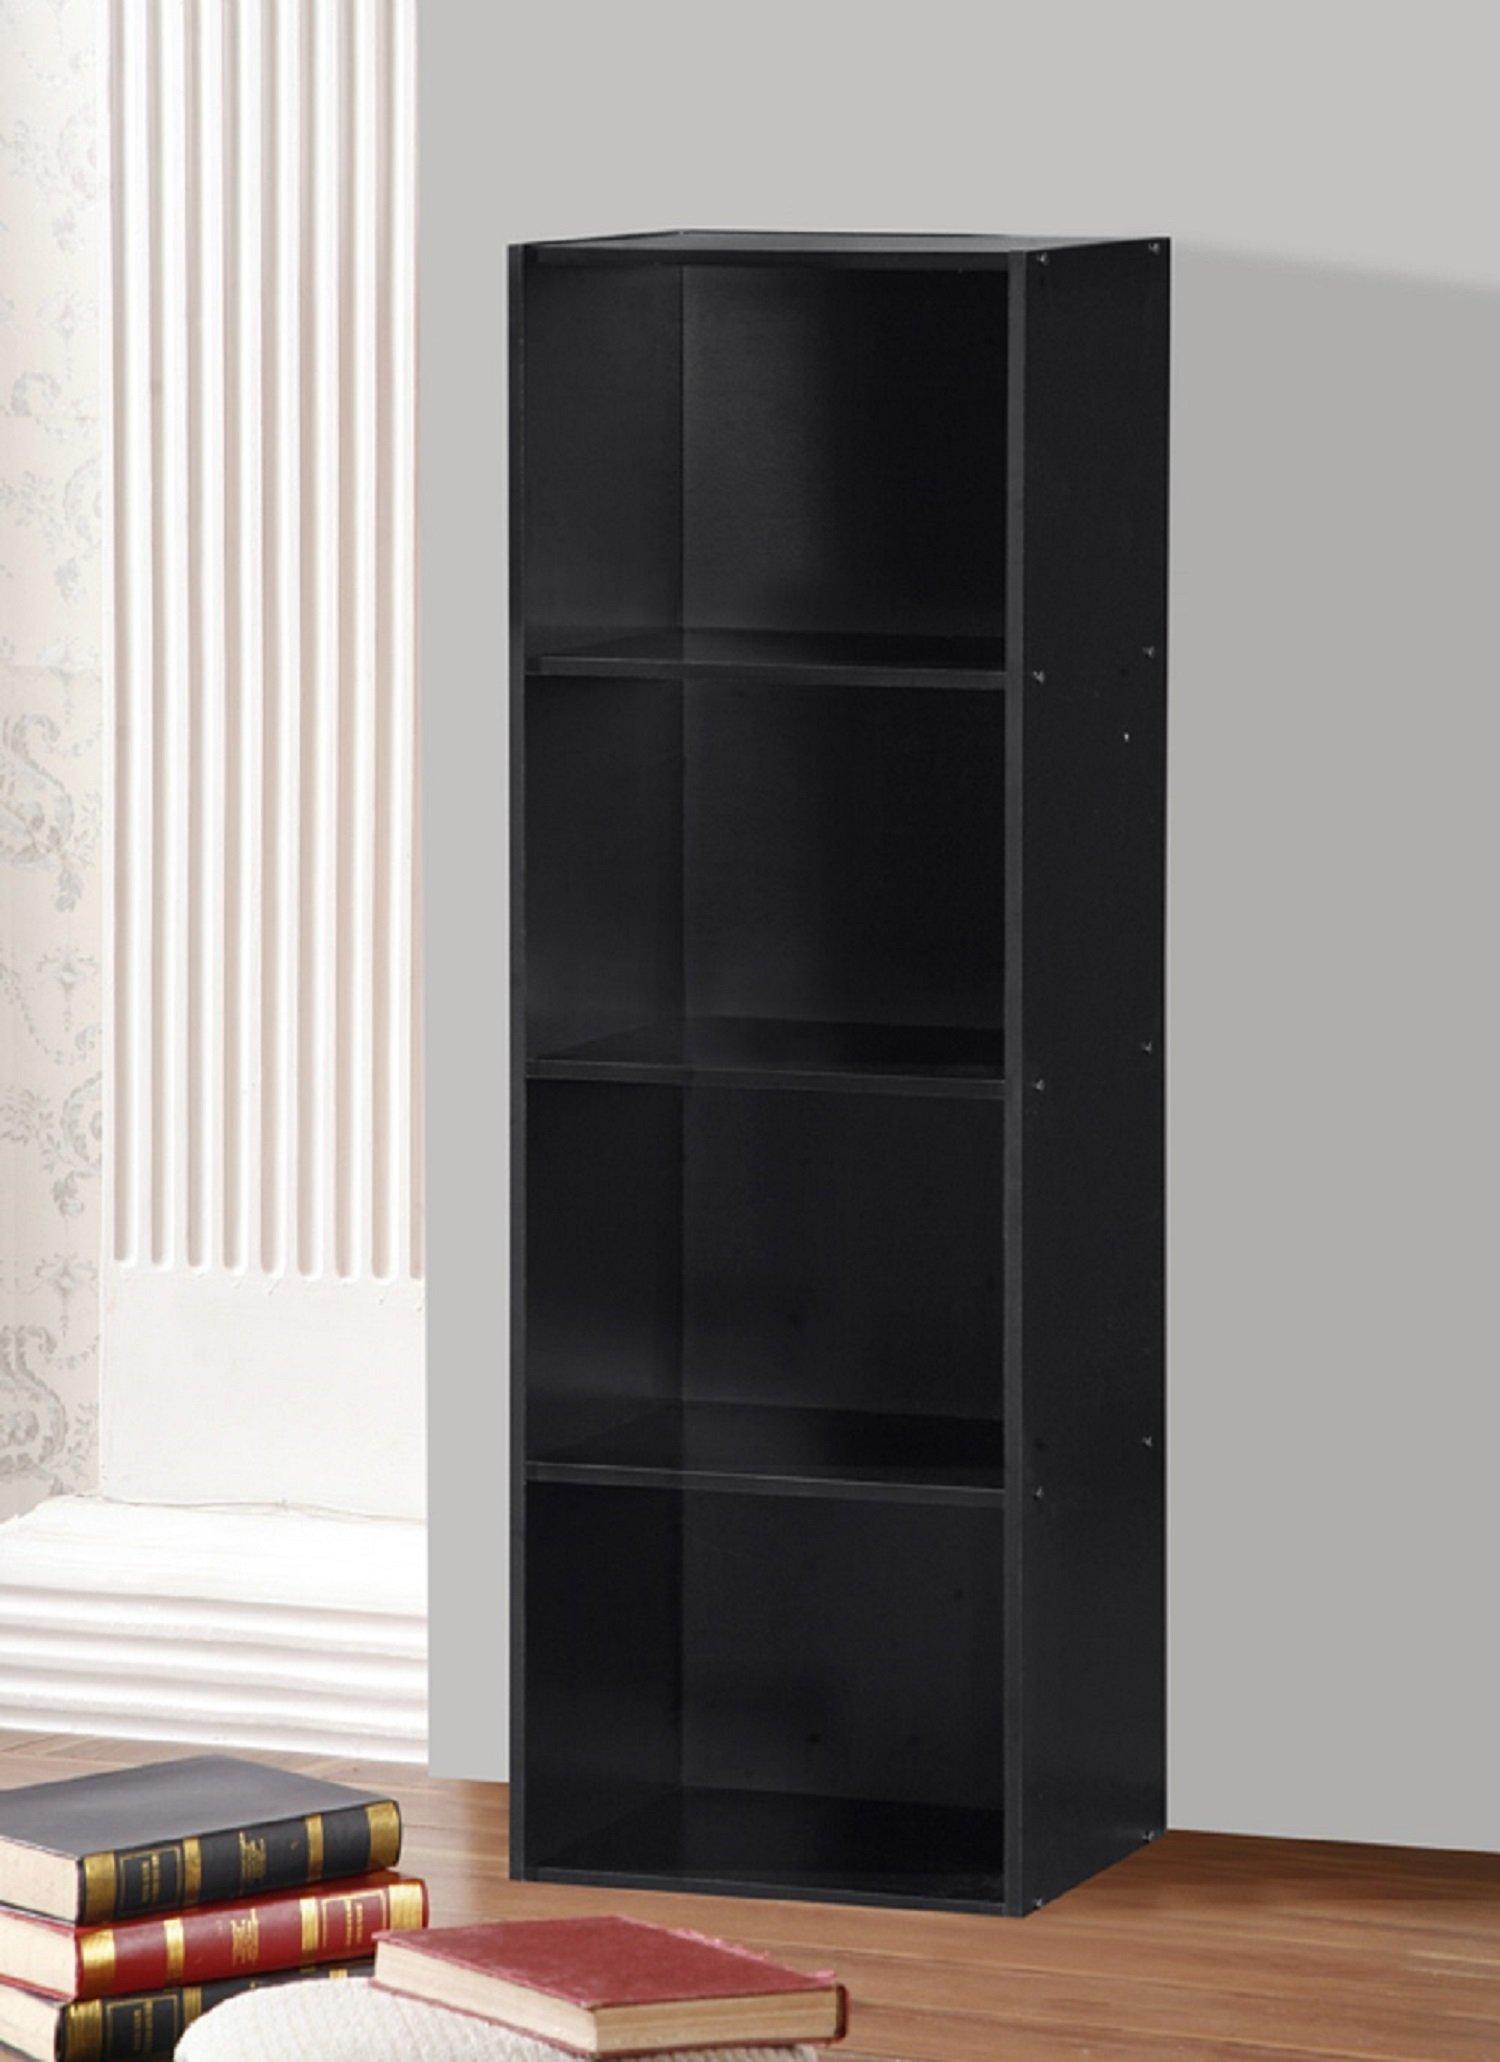 Hodedah 4 Shelve Bookcase, Black by HODEDAH IMPORT (Image #2)